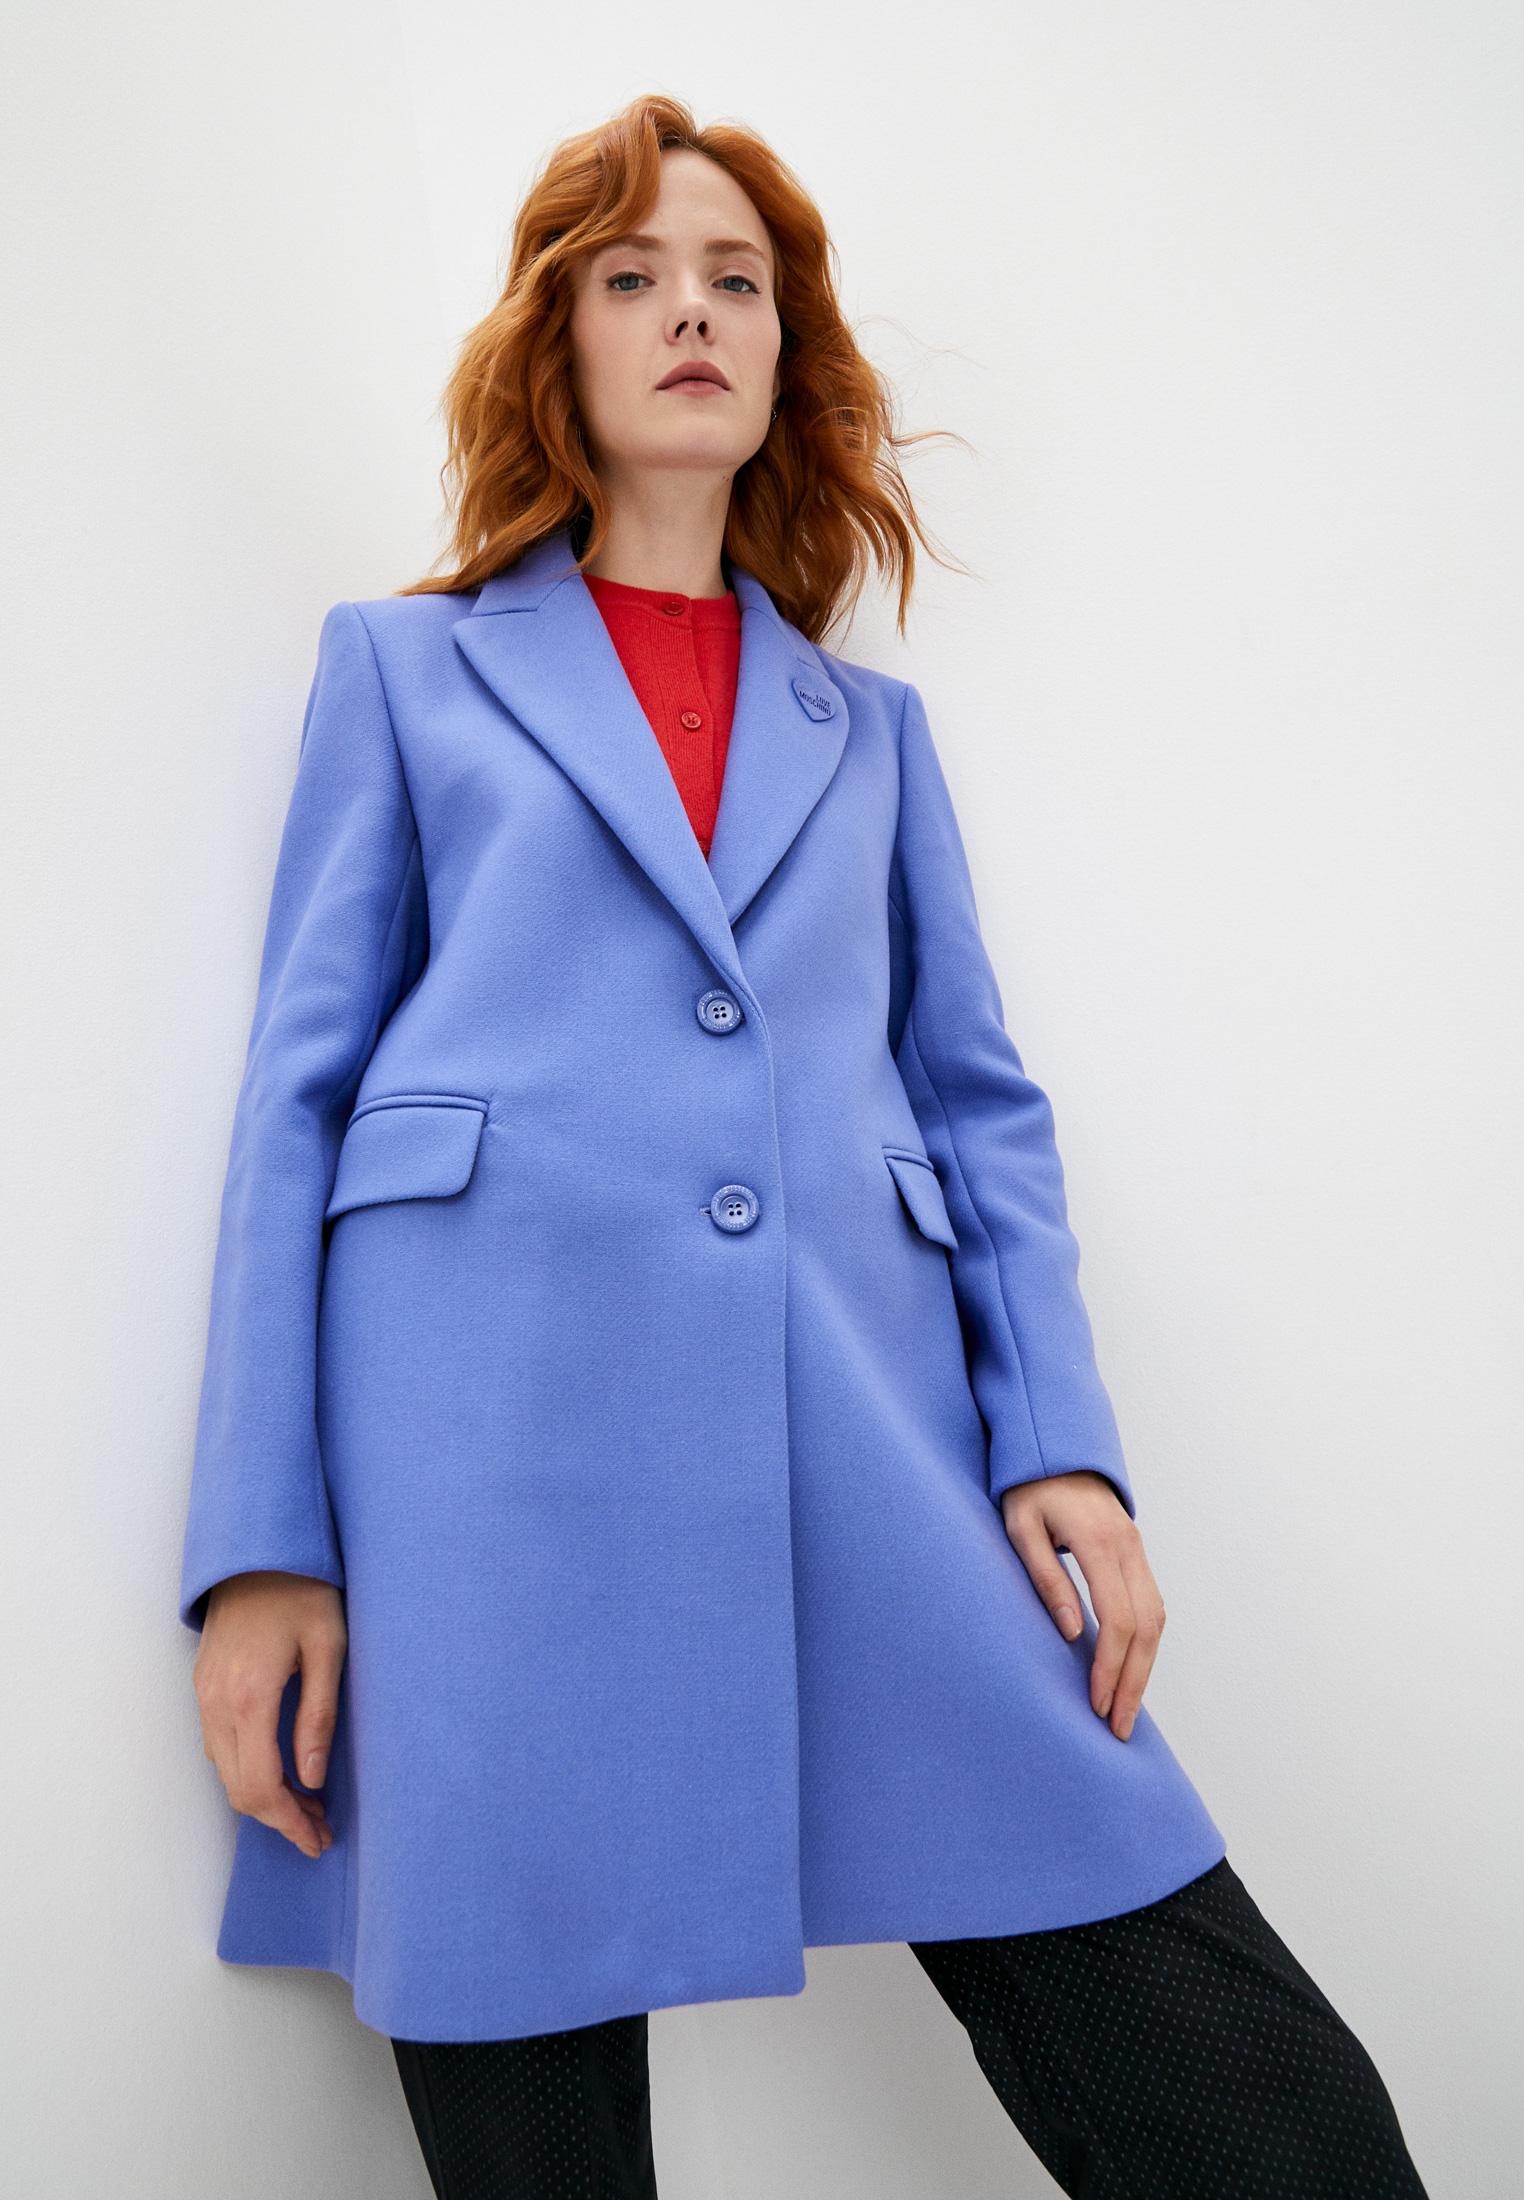 Женские пальто Love Moschino (Лав Москино) W J 198 80 T 008A